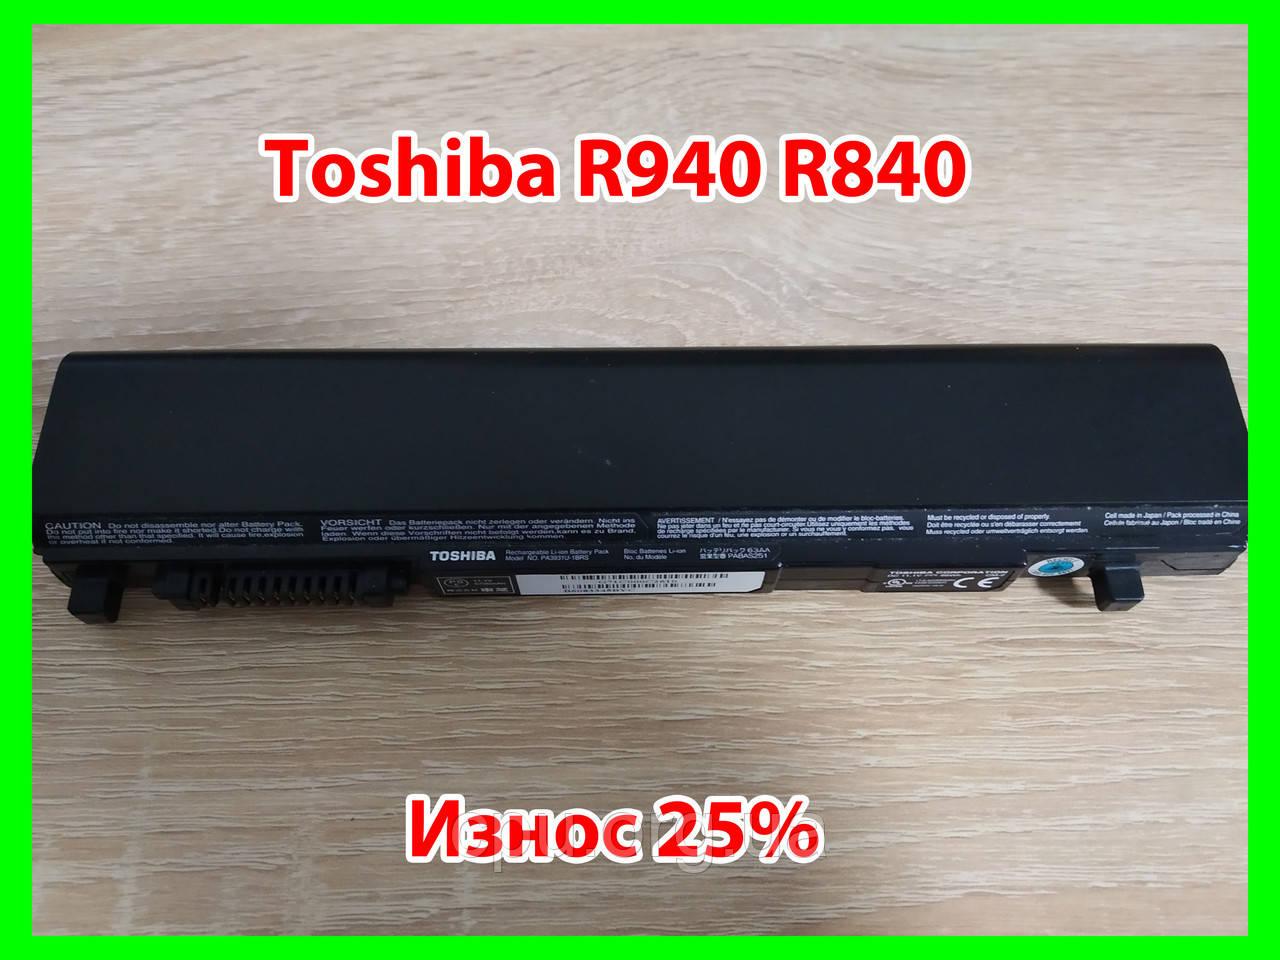 Оригинальный аккумулятор батарея Toshiba R840 R940 66Wh 5700mAh 11V